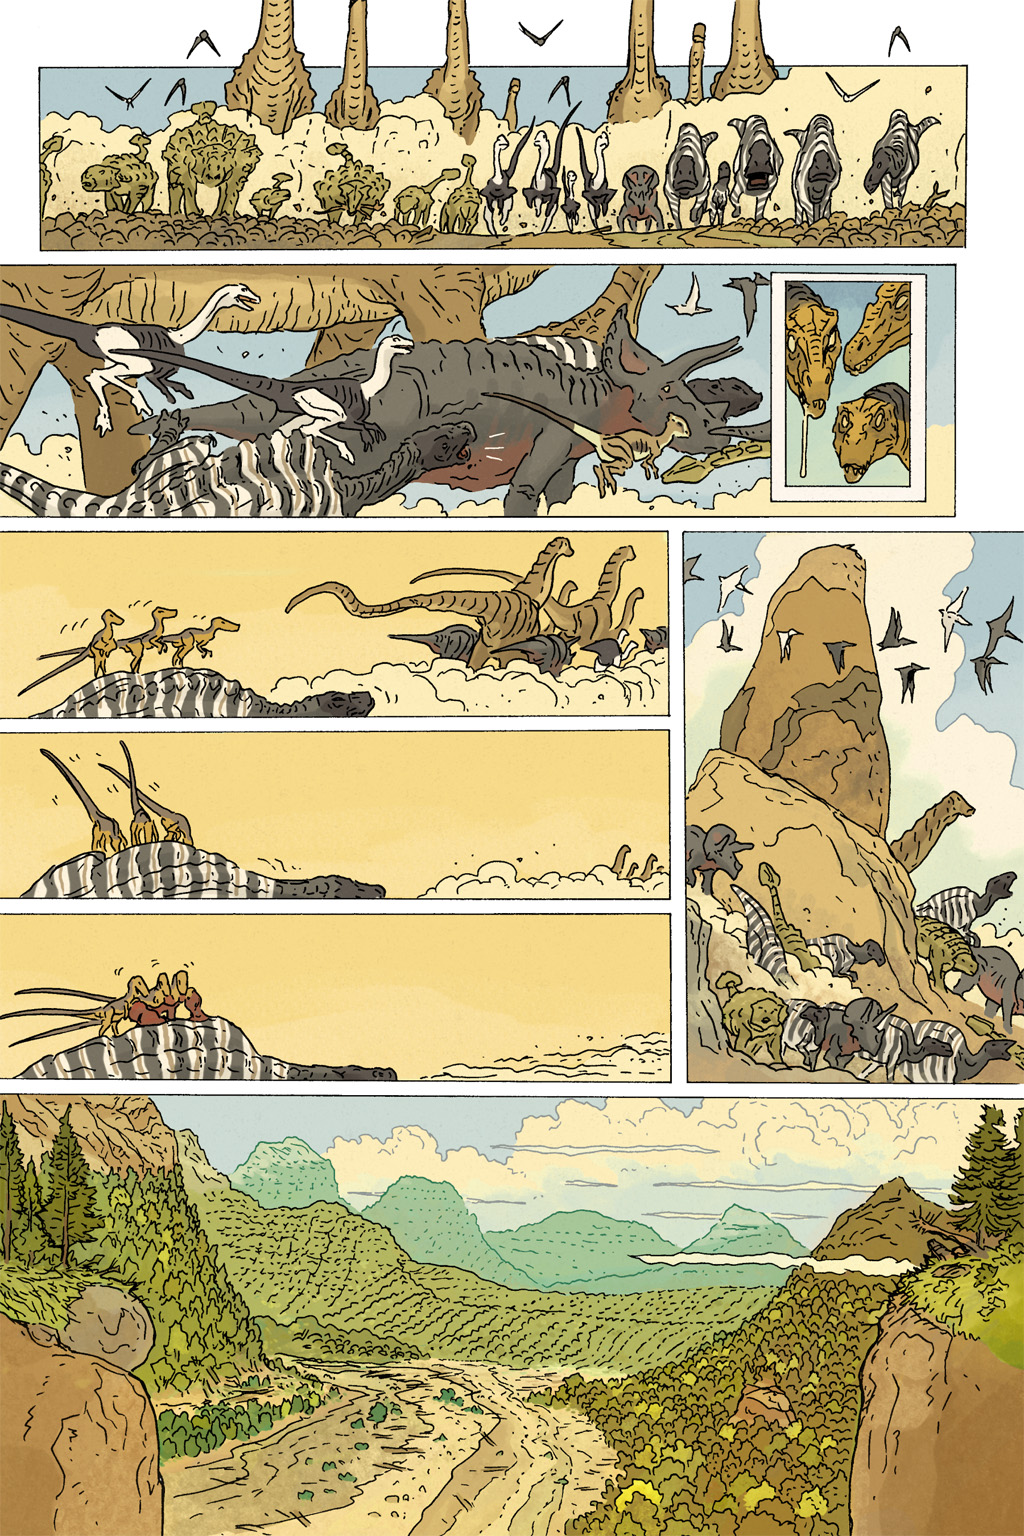 Age of Reptiles Omnibus Chap 10 - Next Chap 11